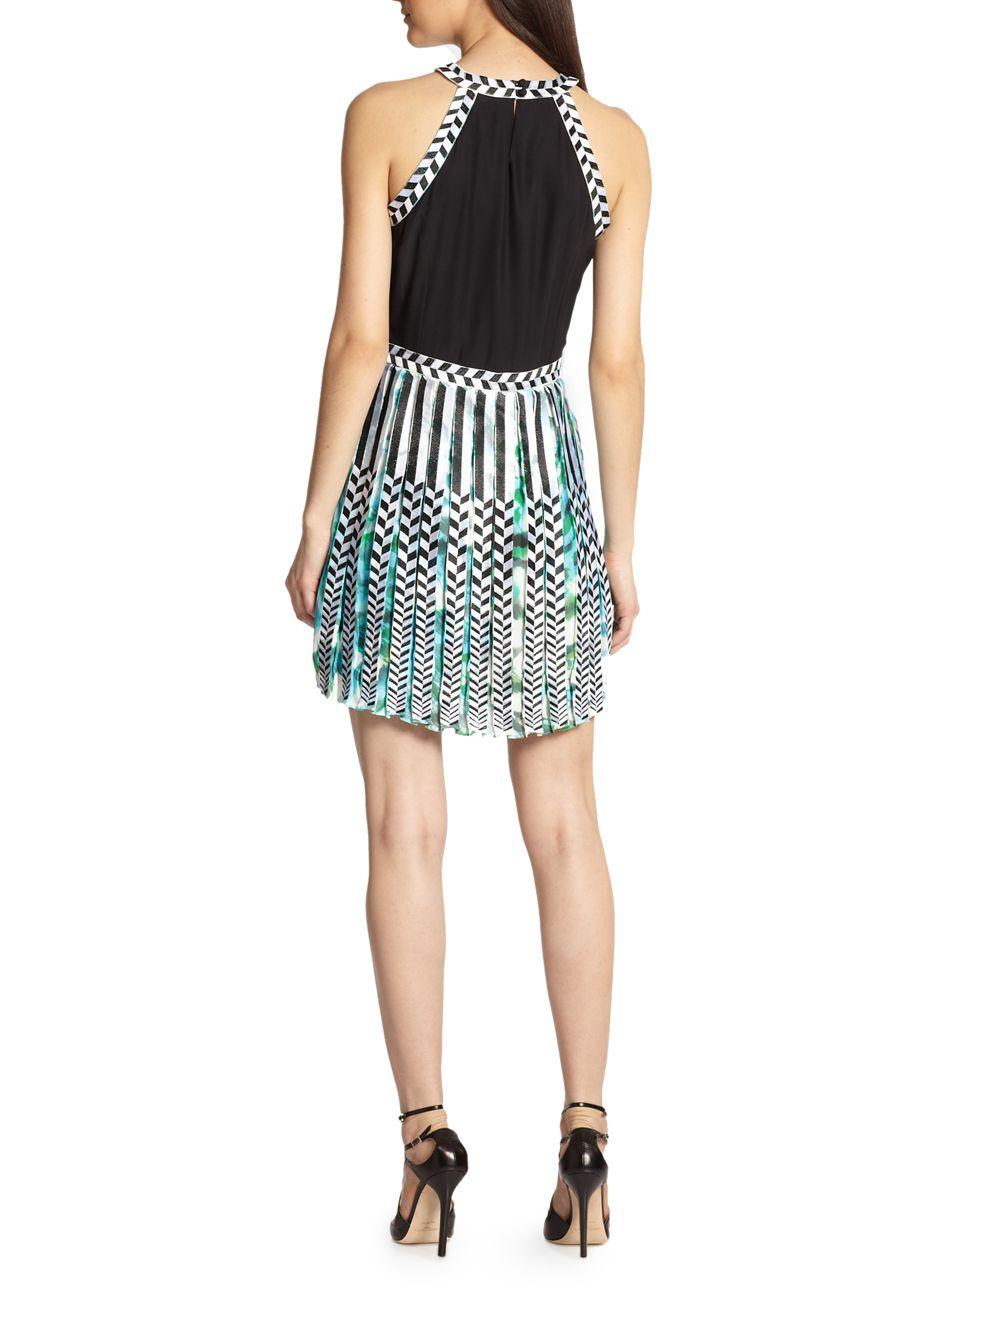 Lyst - Parker Selita Silk Embroideredtrim Printed Dress in Blue 6567c7539